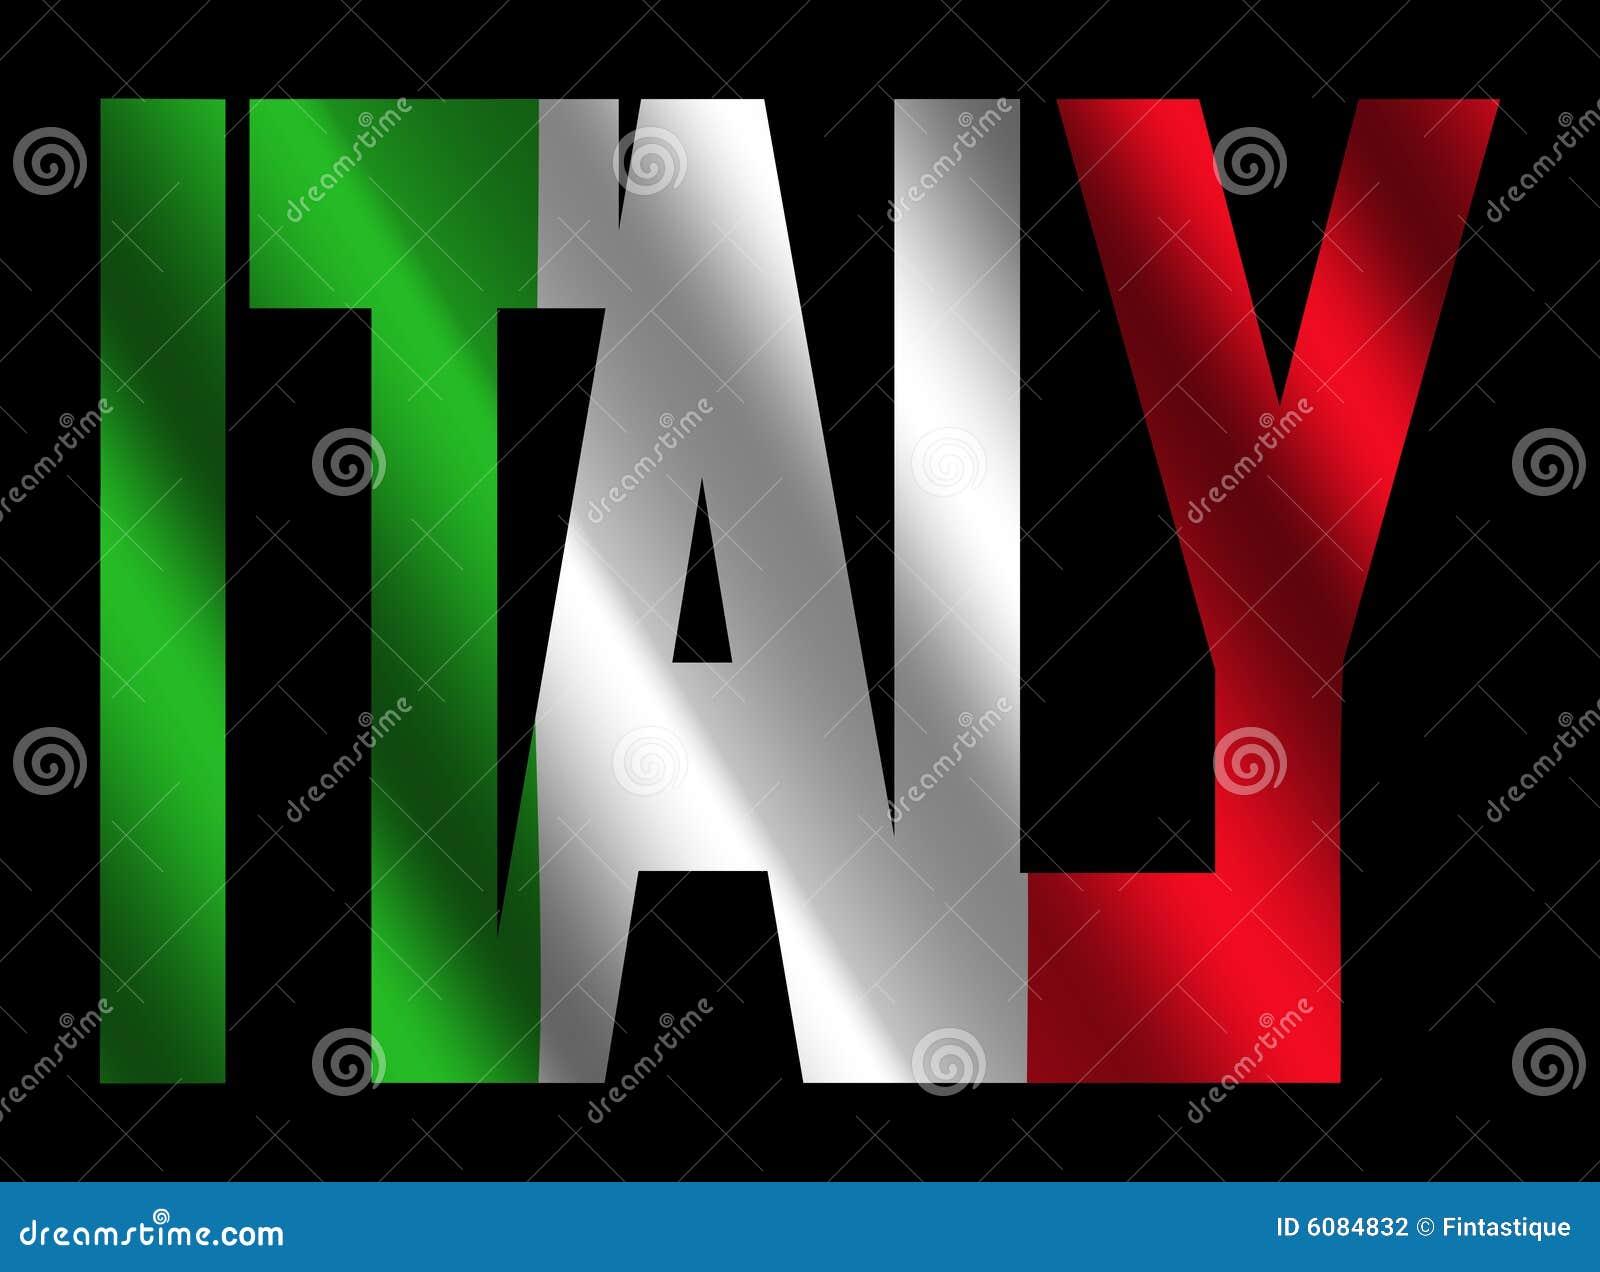 Italy text with Italian flag